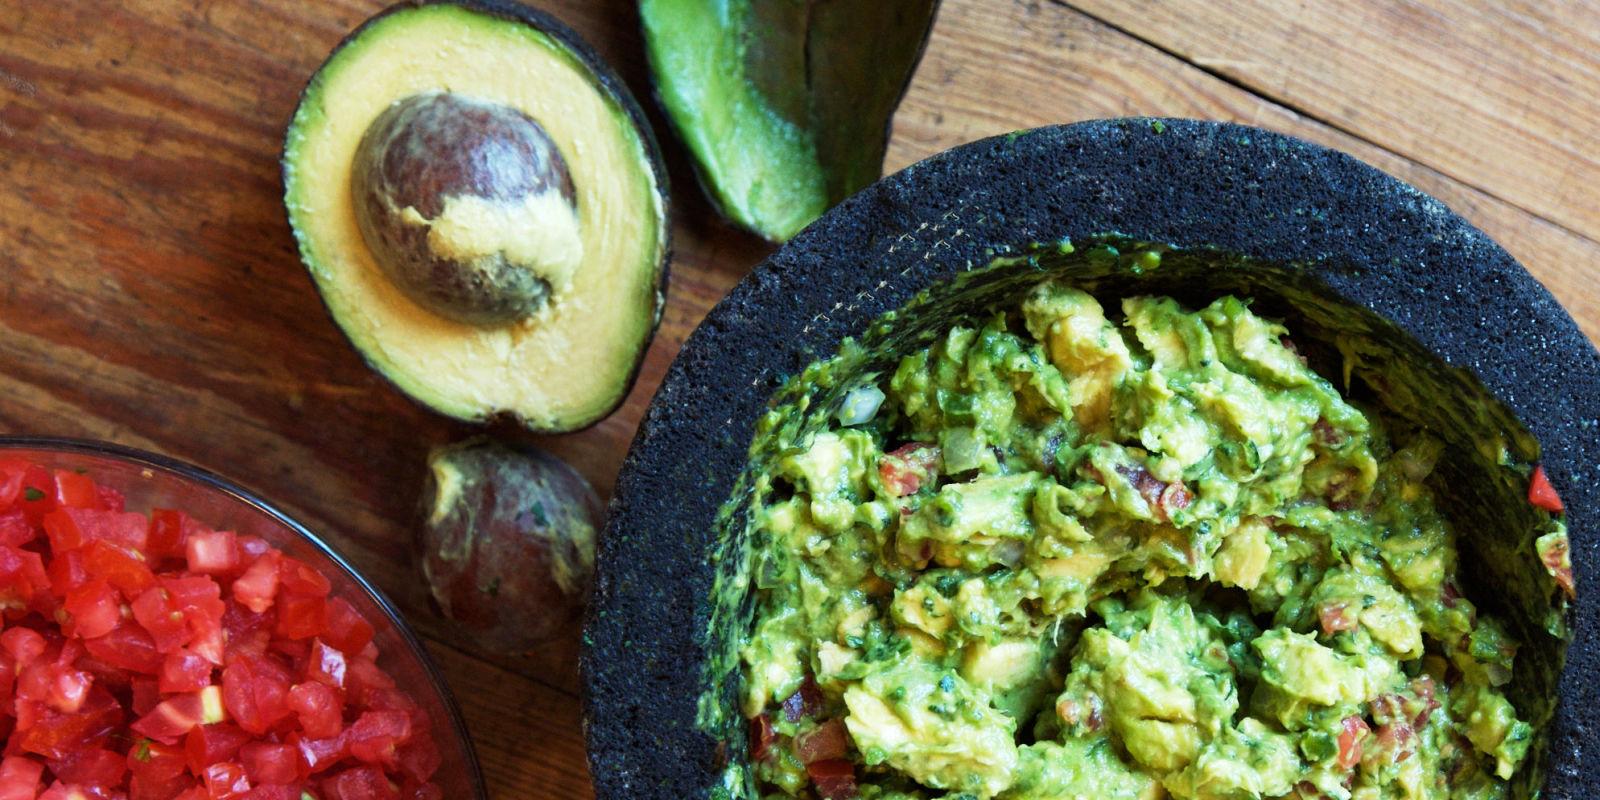 how to make guacamole salsa dip